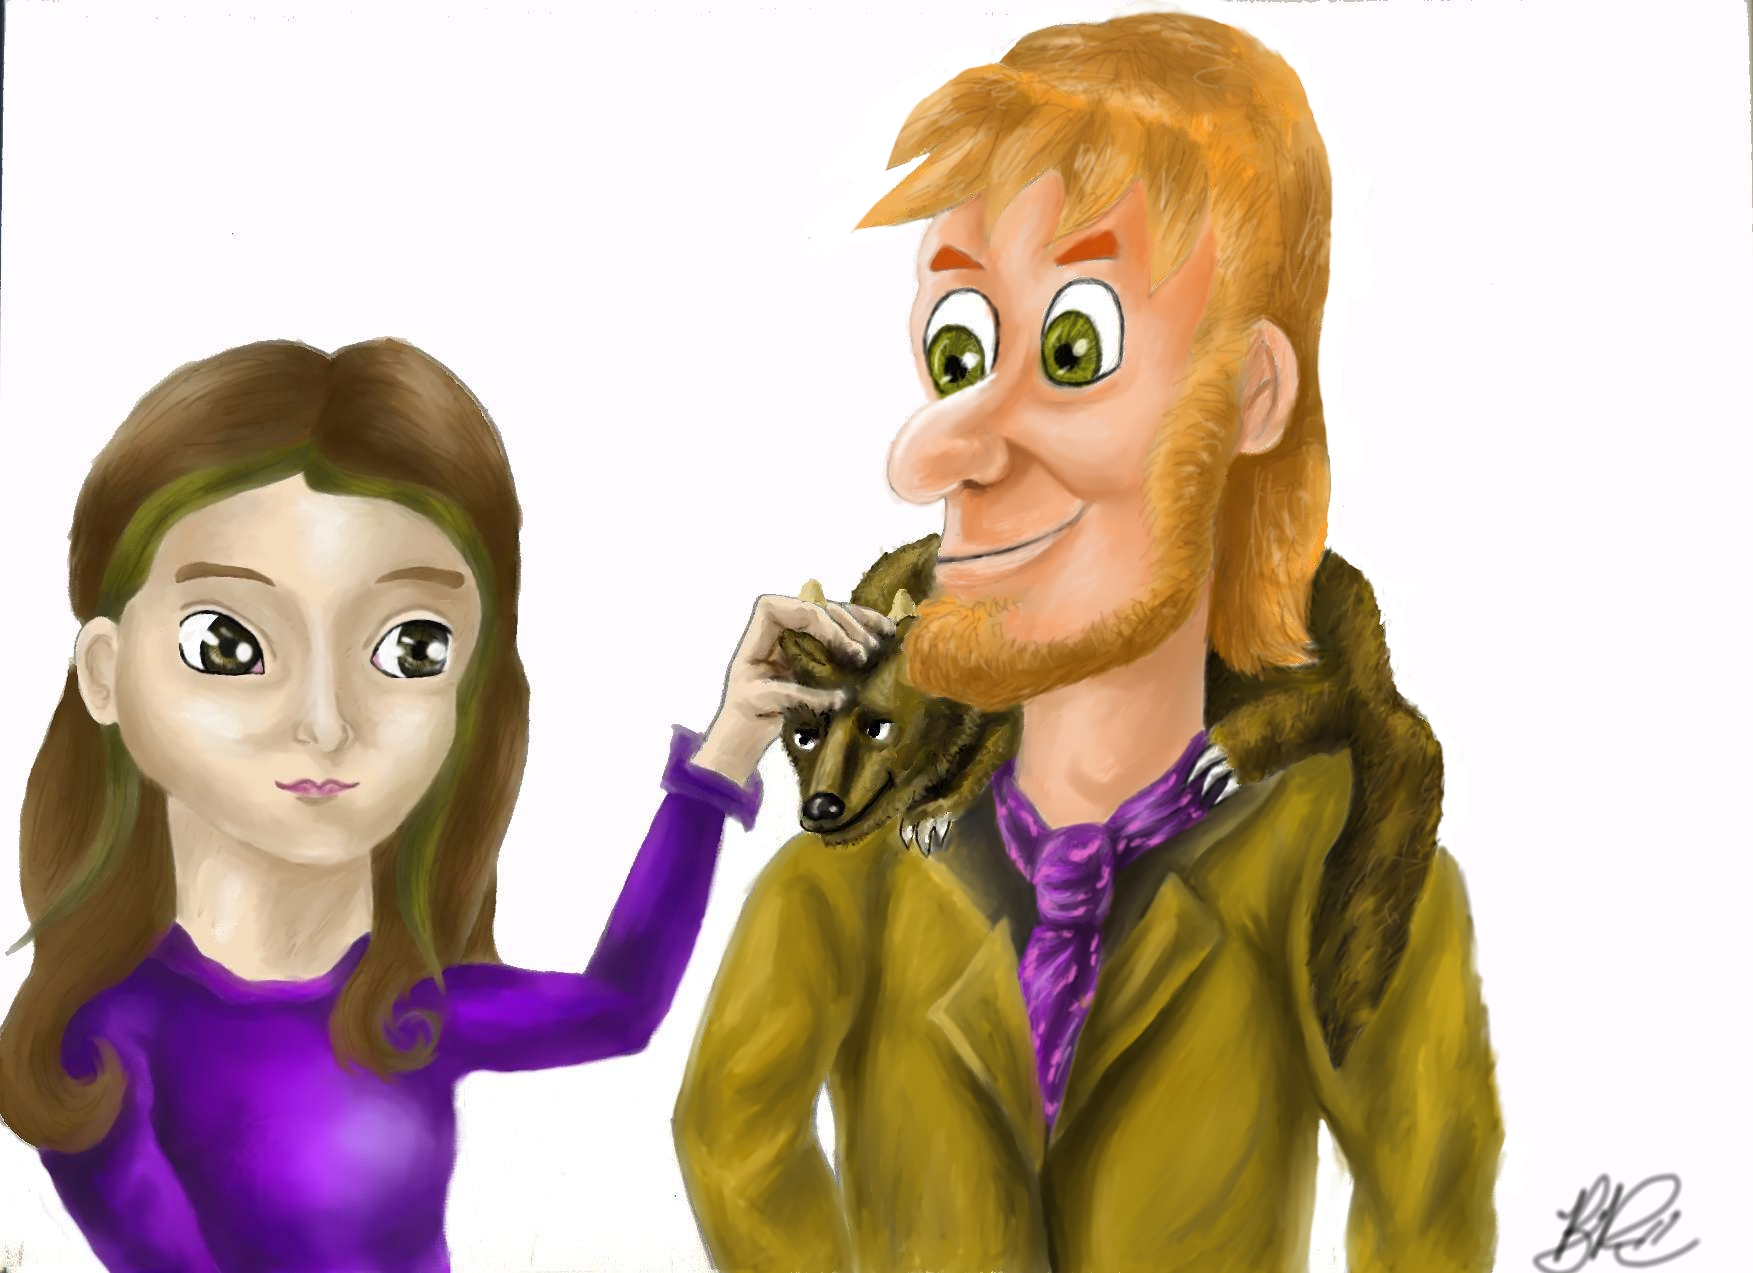 meggie and dustfinger